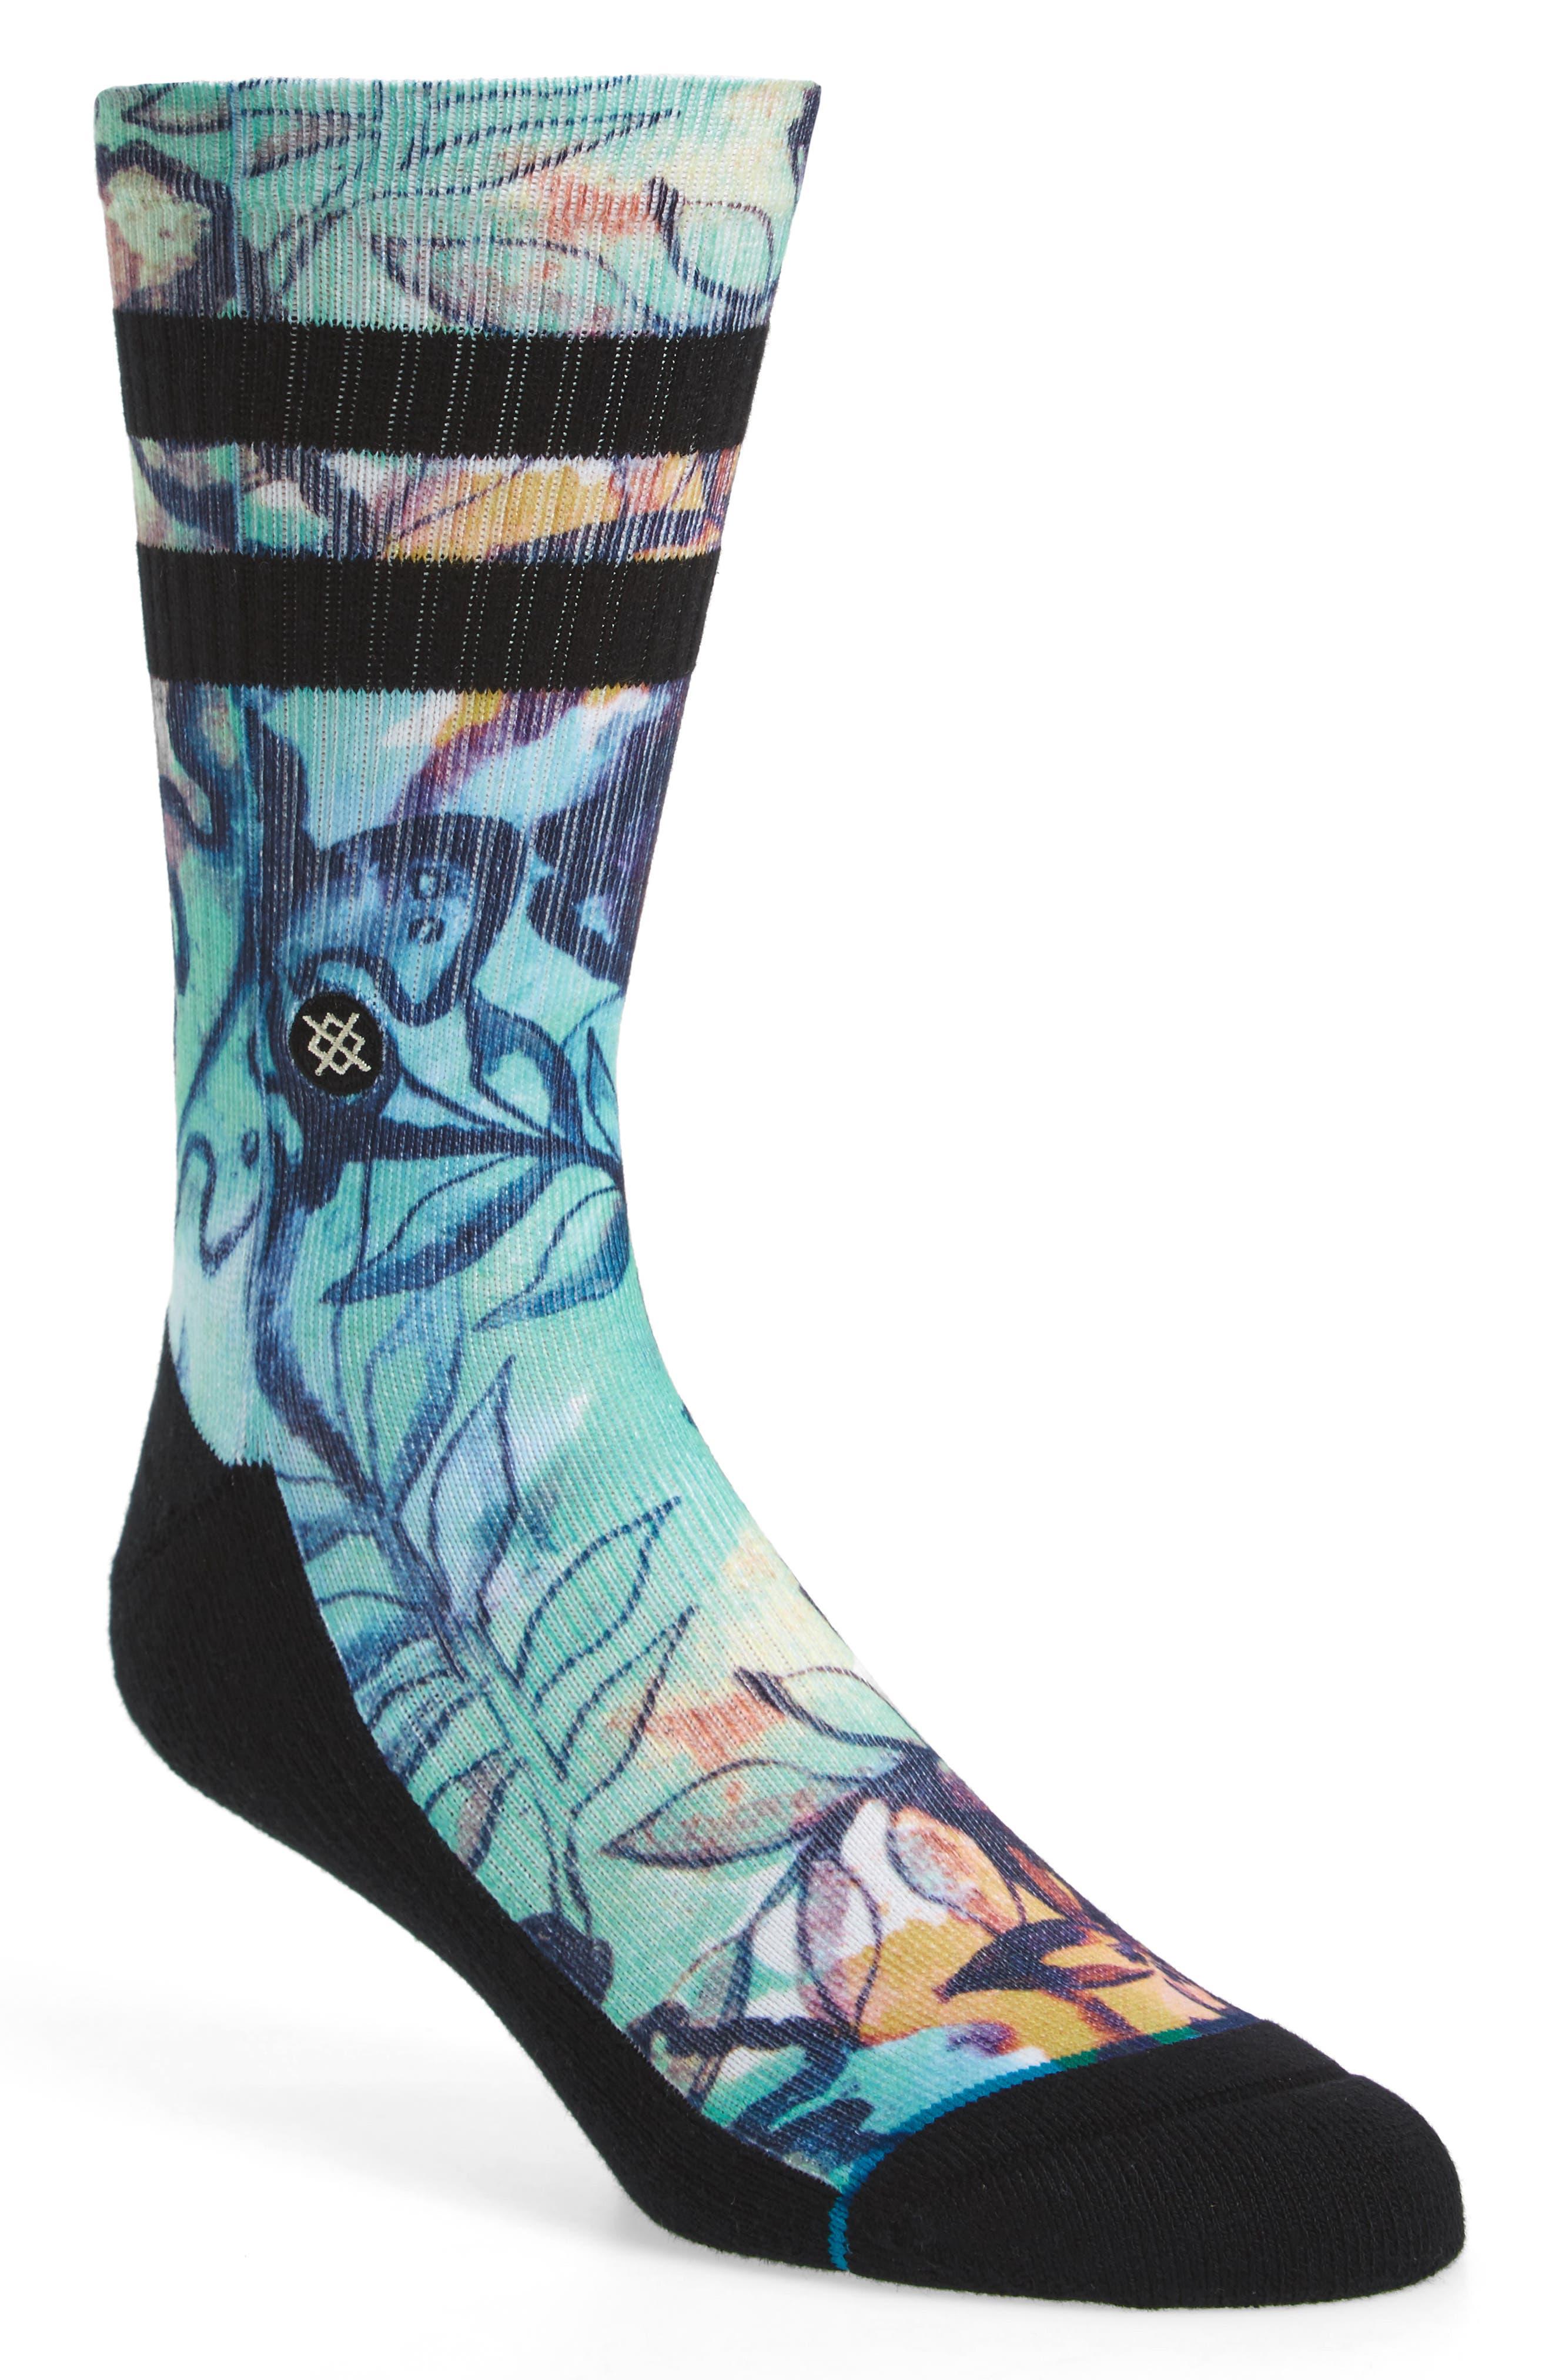 Durangoh Socks,                             Main thumbnail 1, color,                             400